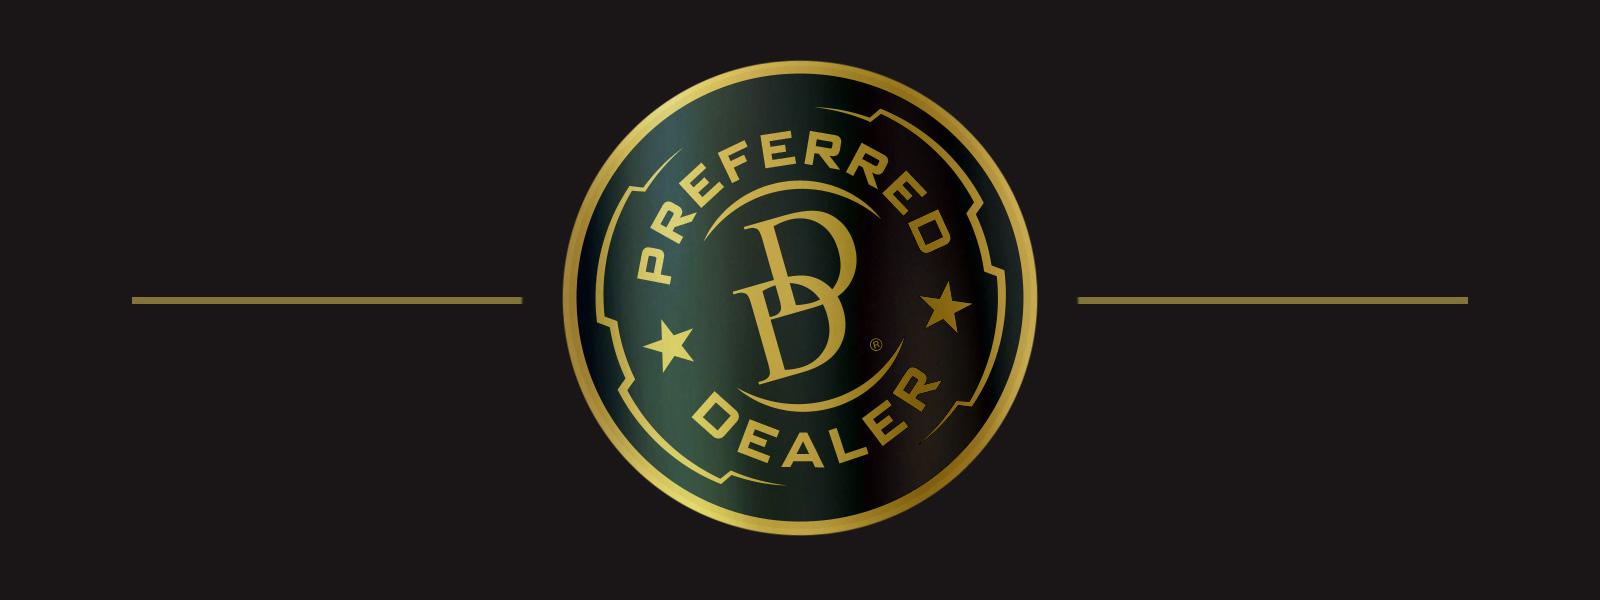 Preferred Dealer Banner